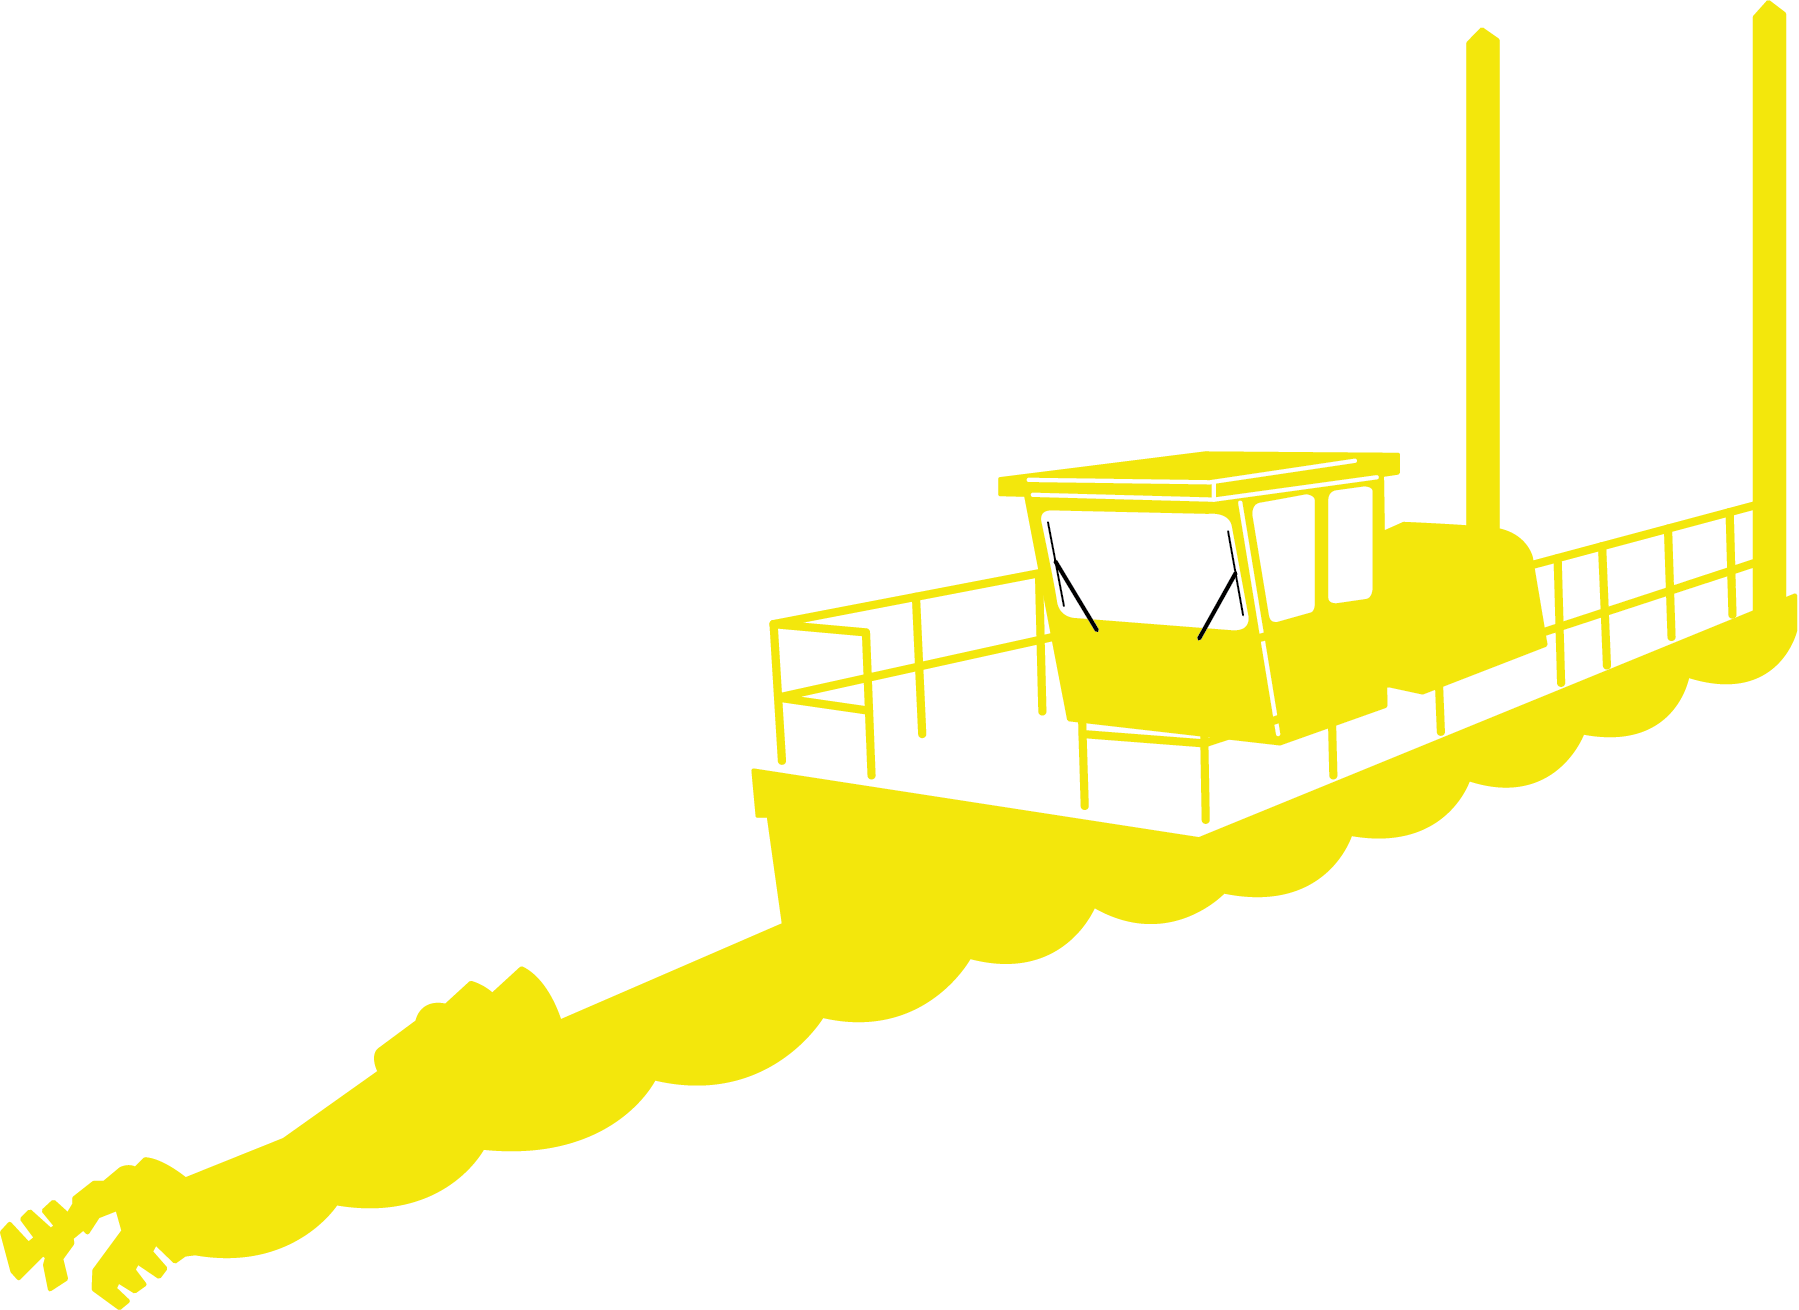 Sistema Limpiaparabrisas para Botes de Dragado